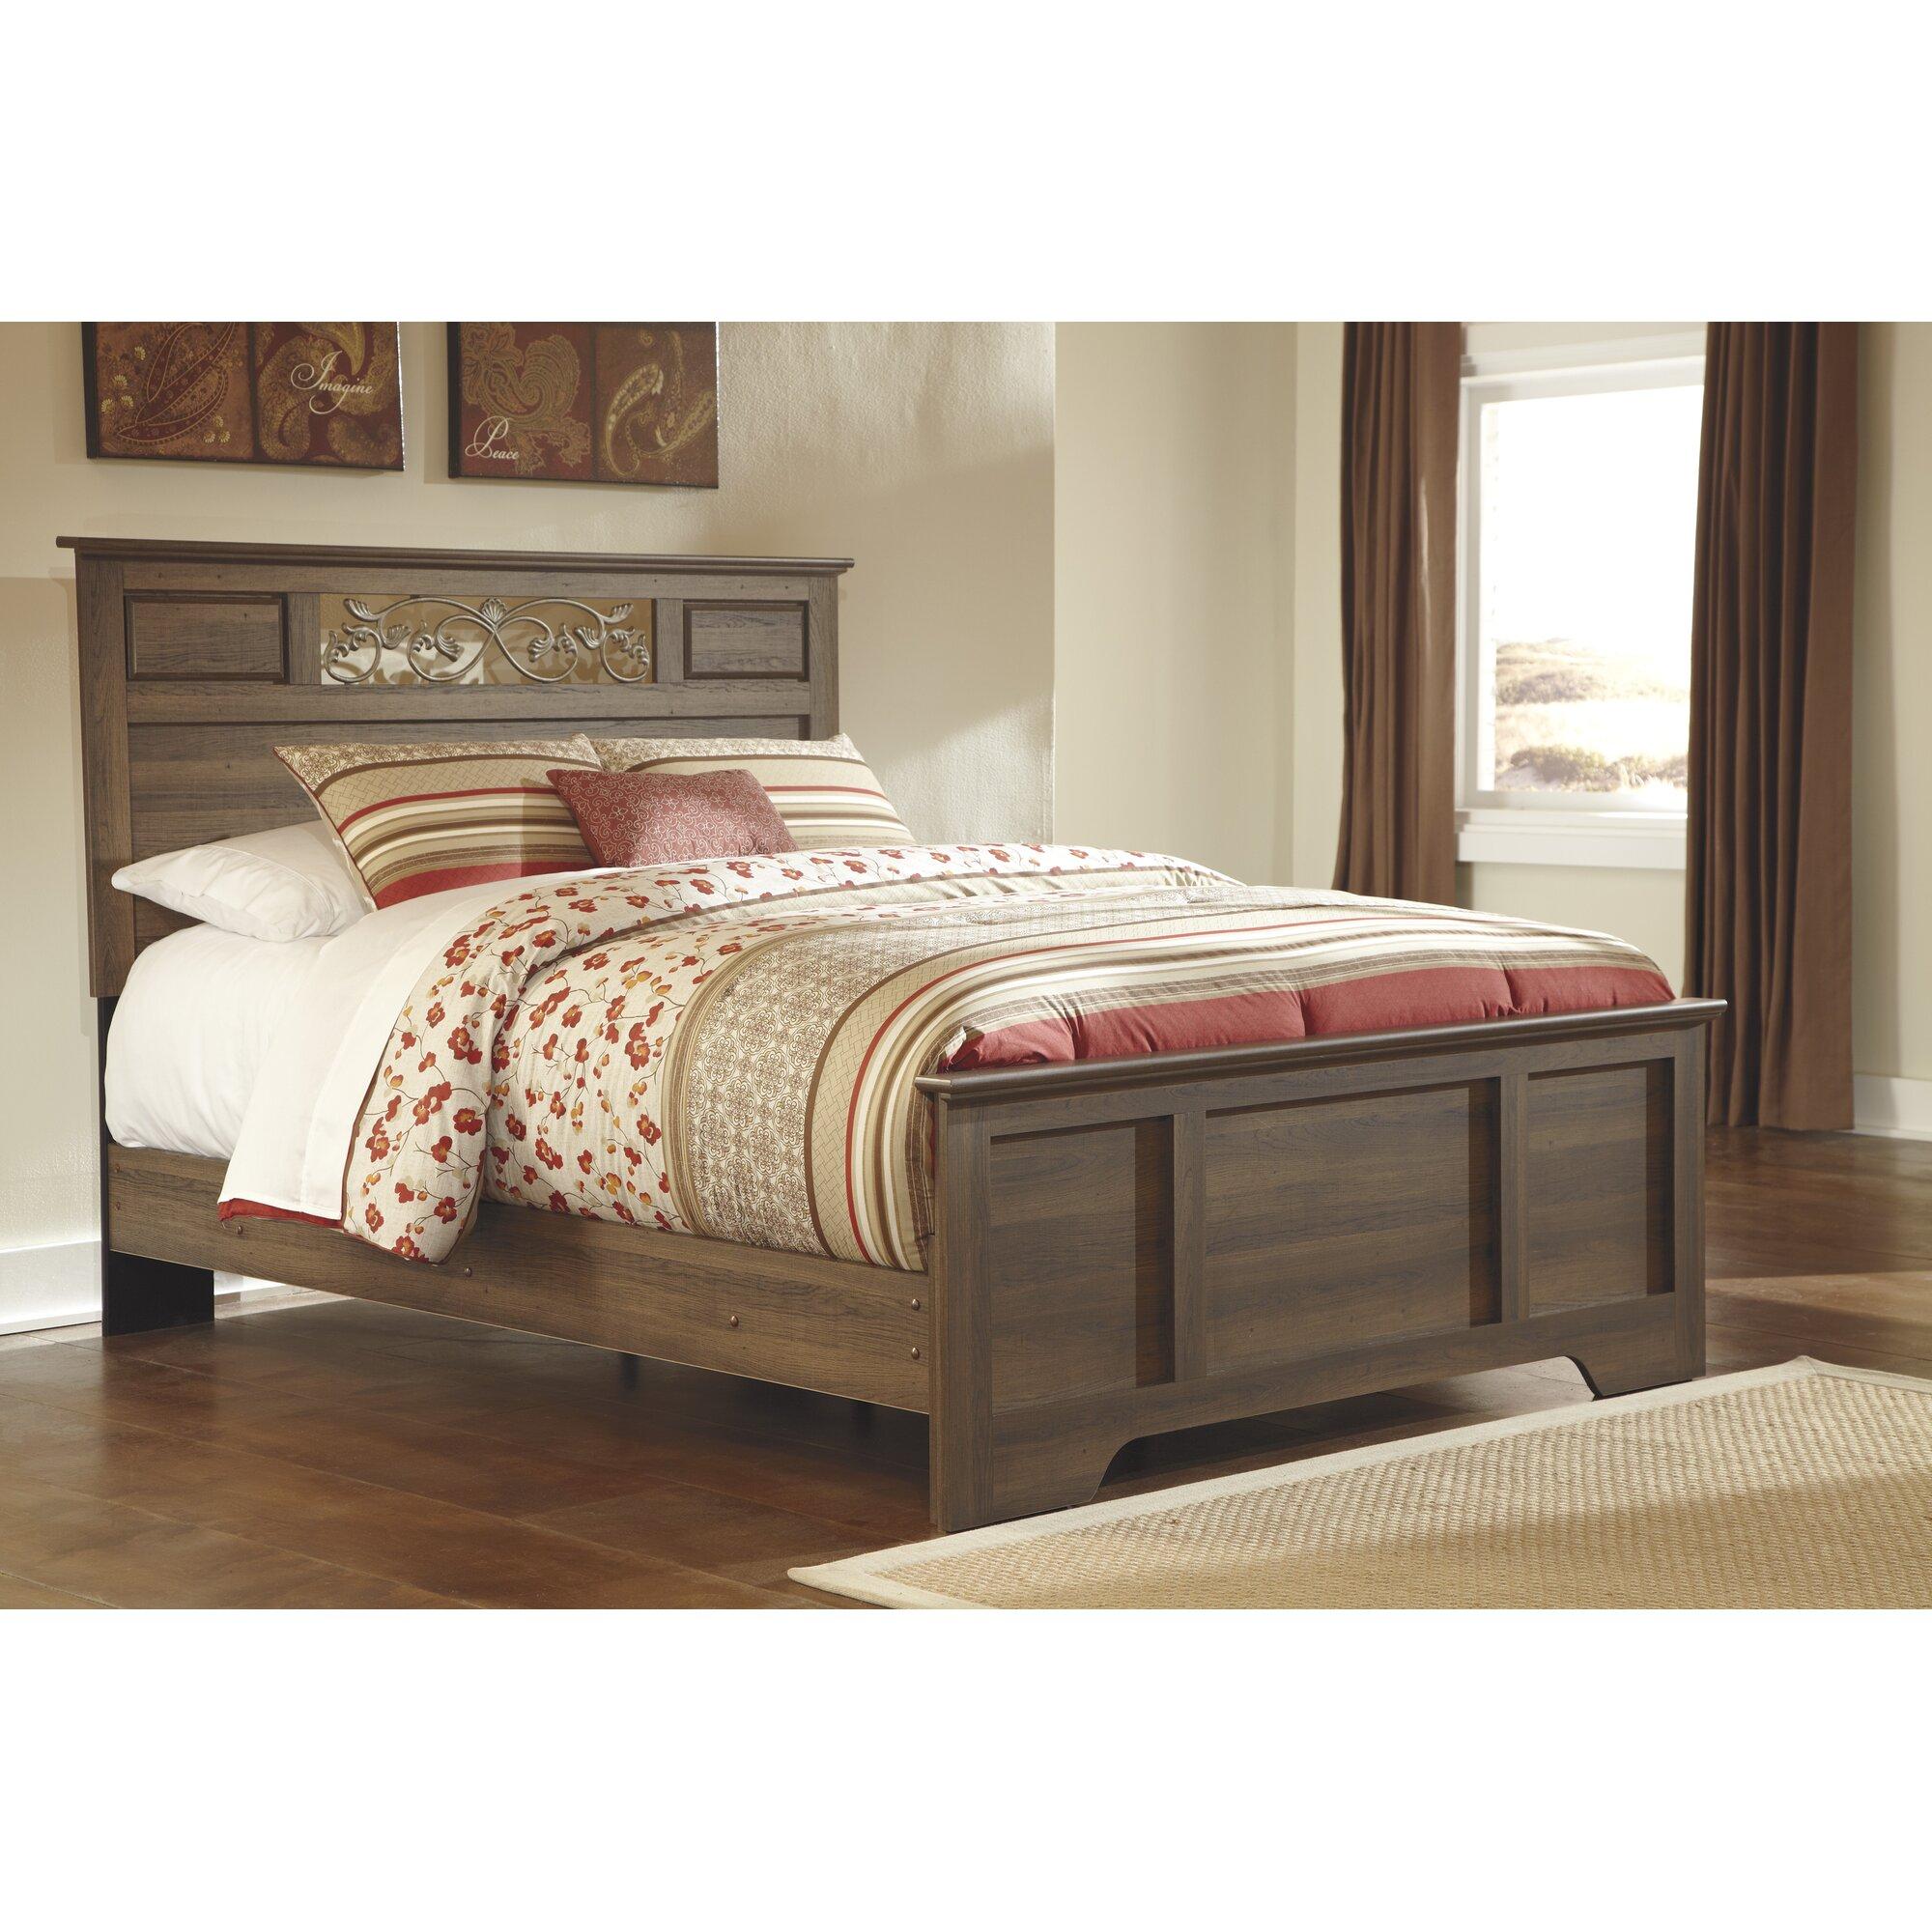 August Grove Amalia Queen Panel Customizable Bedroom Set